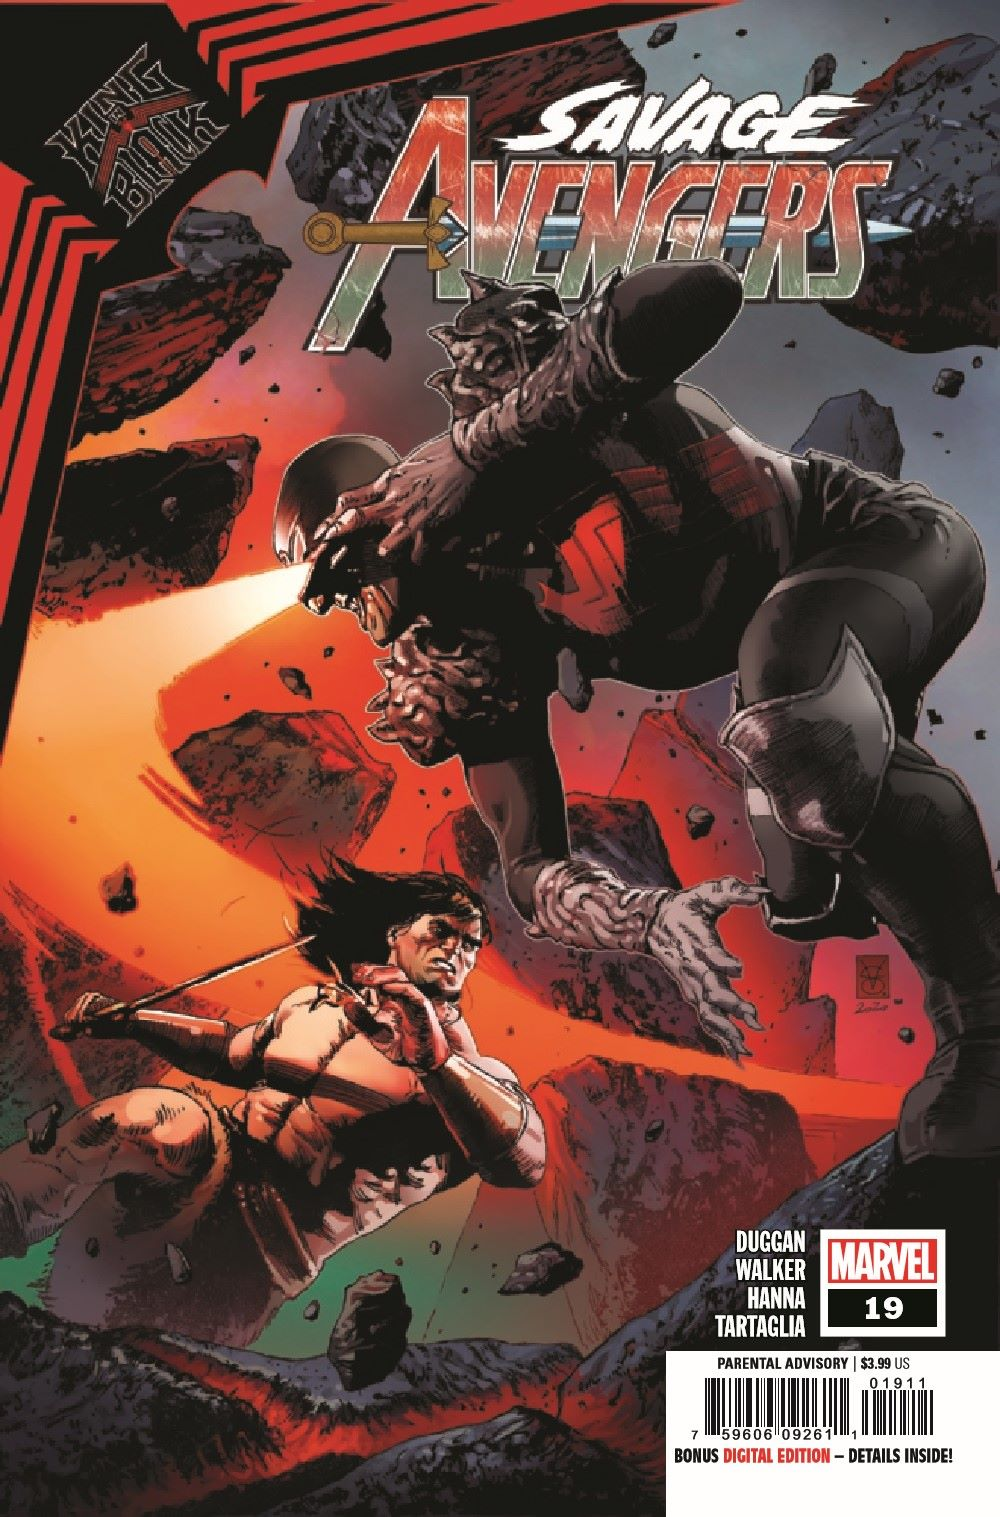 SAVAVEN2018019_Preview-1 ComicList Previews: SAVAGE AVENGERS #19